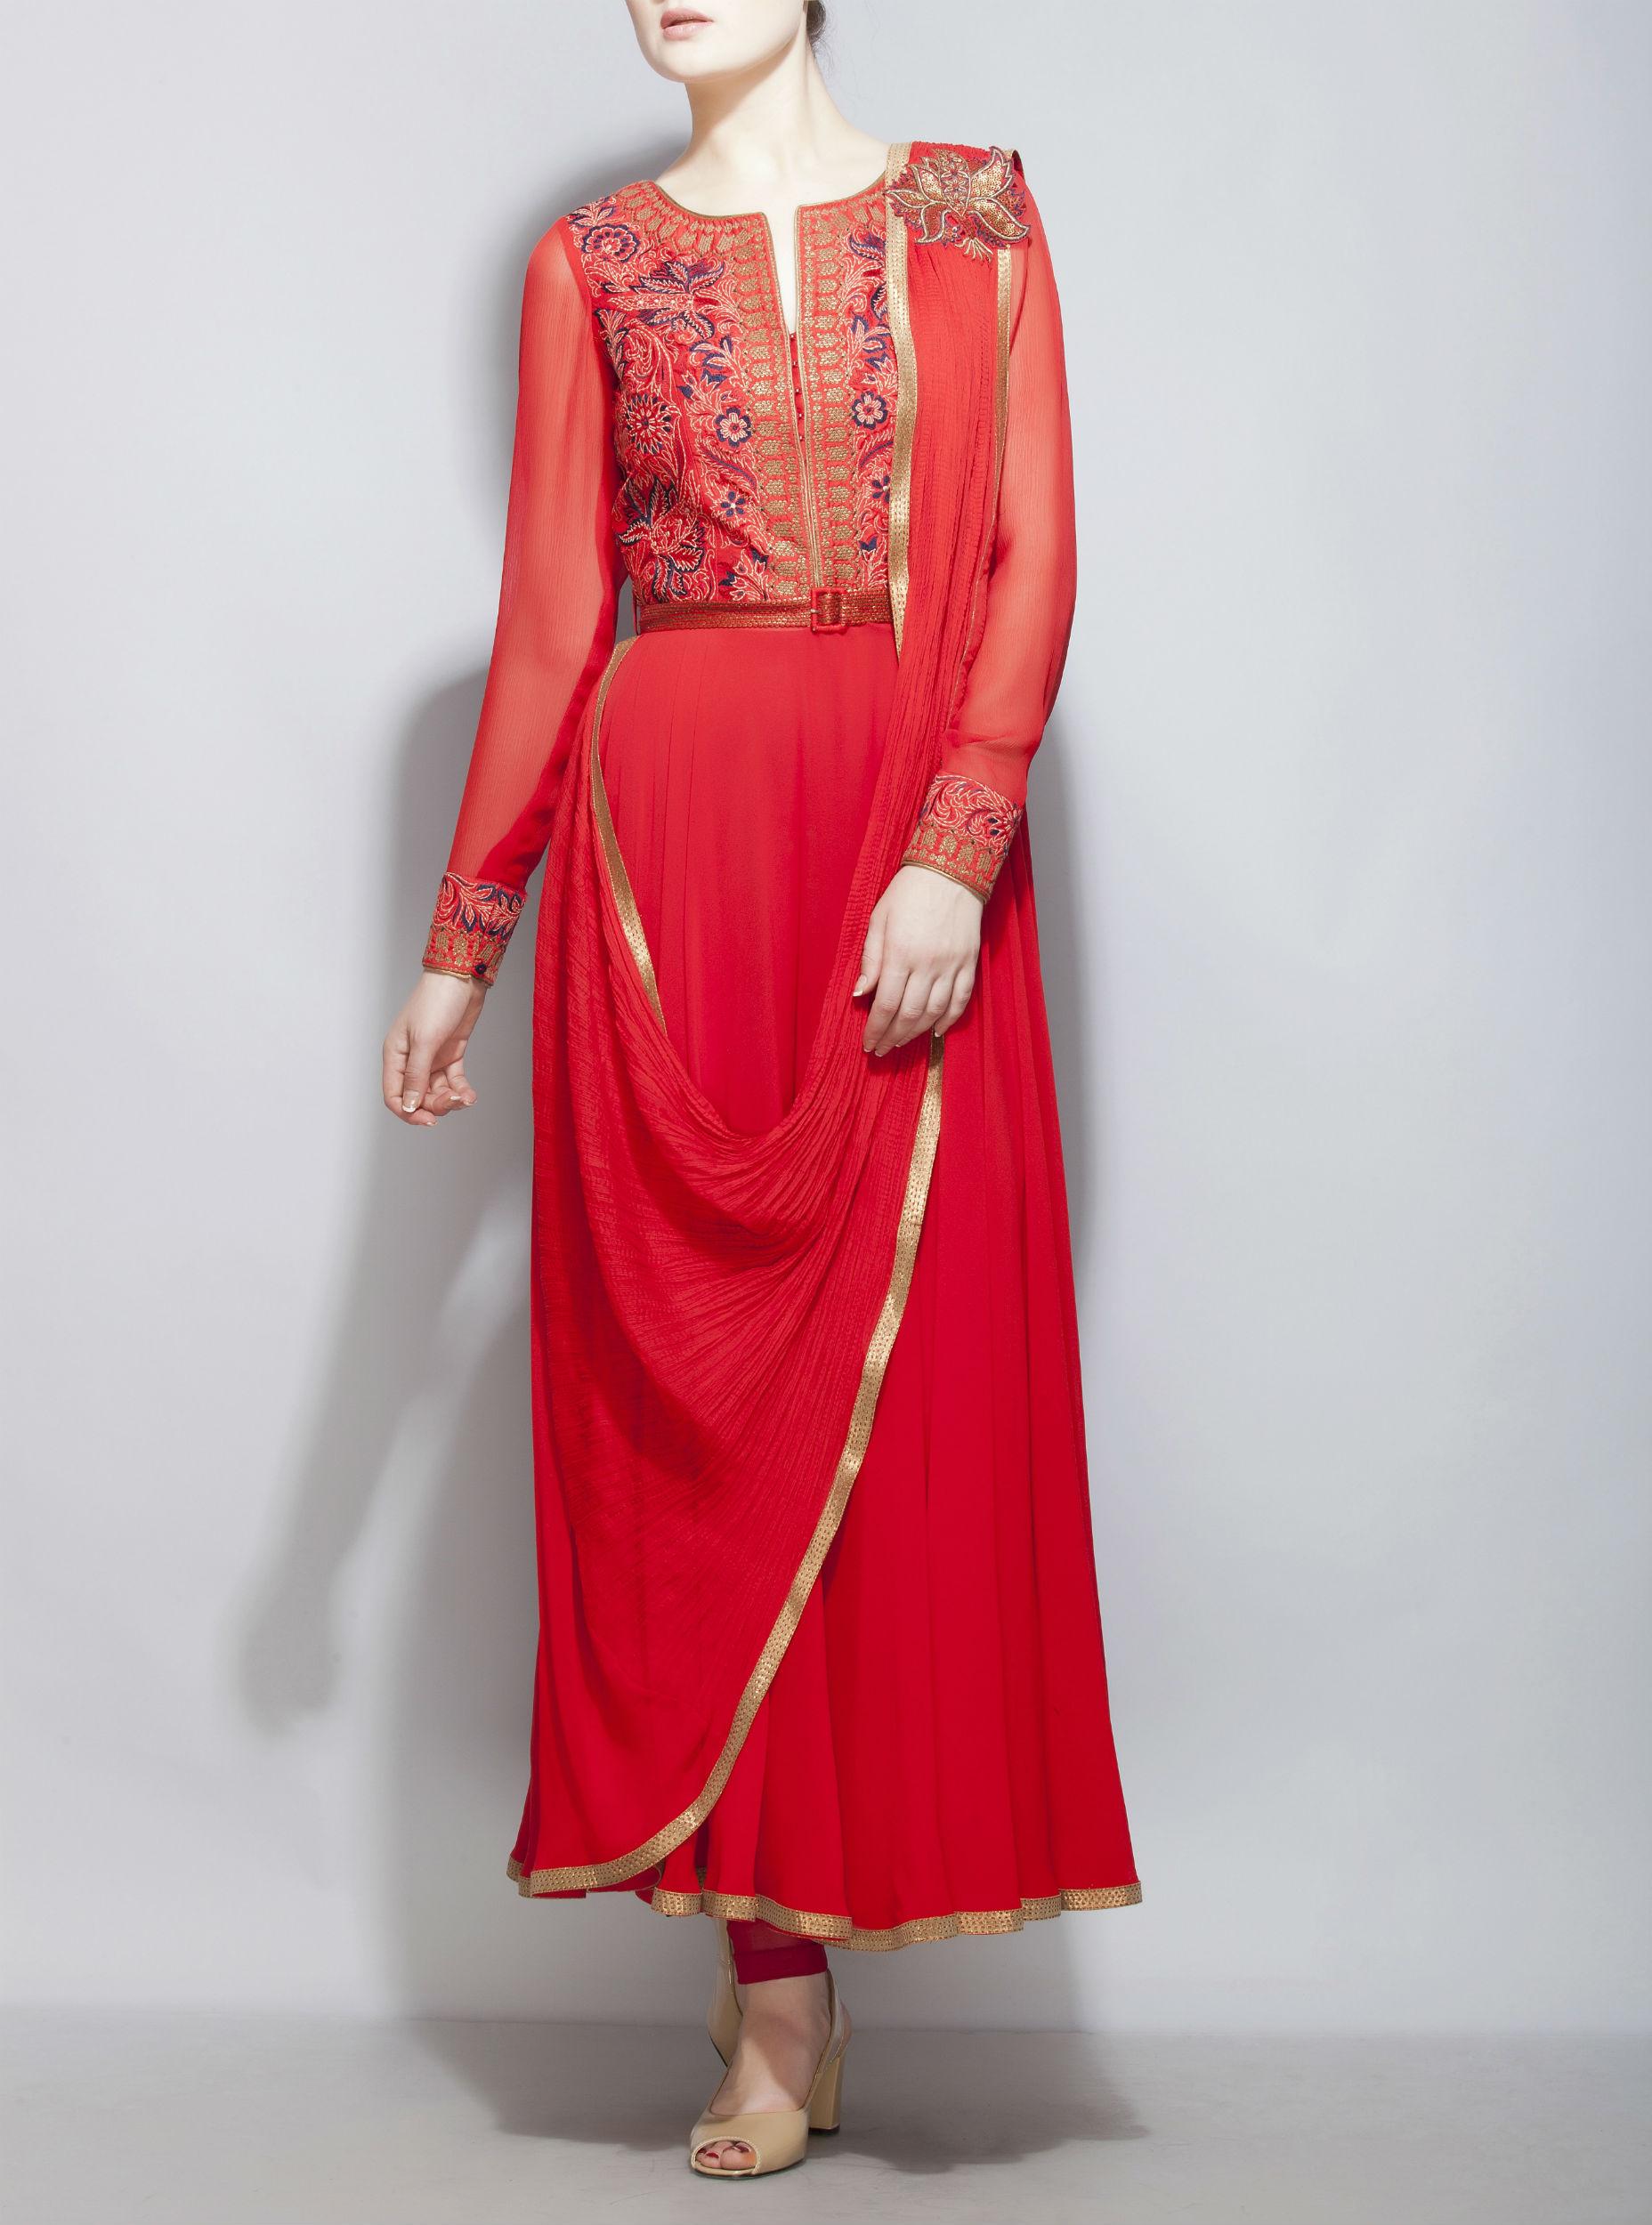 Red Draped Indo Western Dress By Divyam Mehta The Secret Label